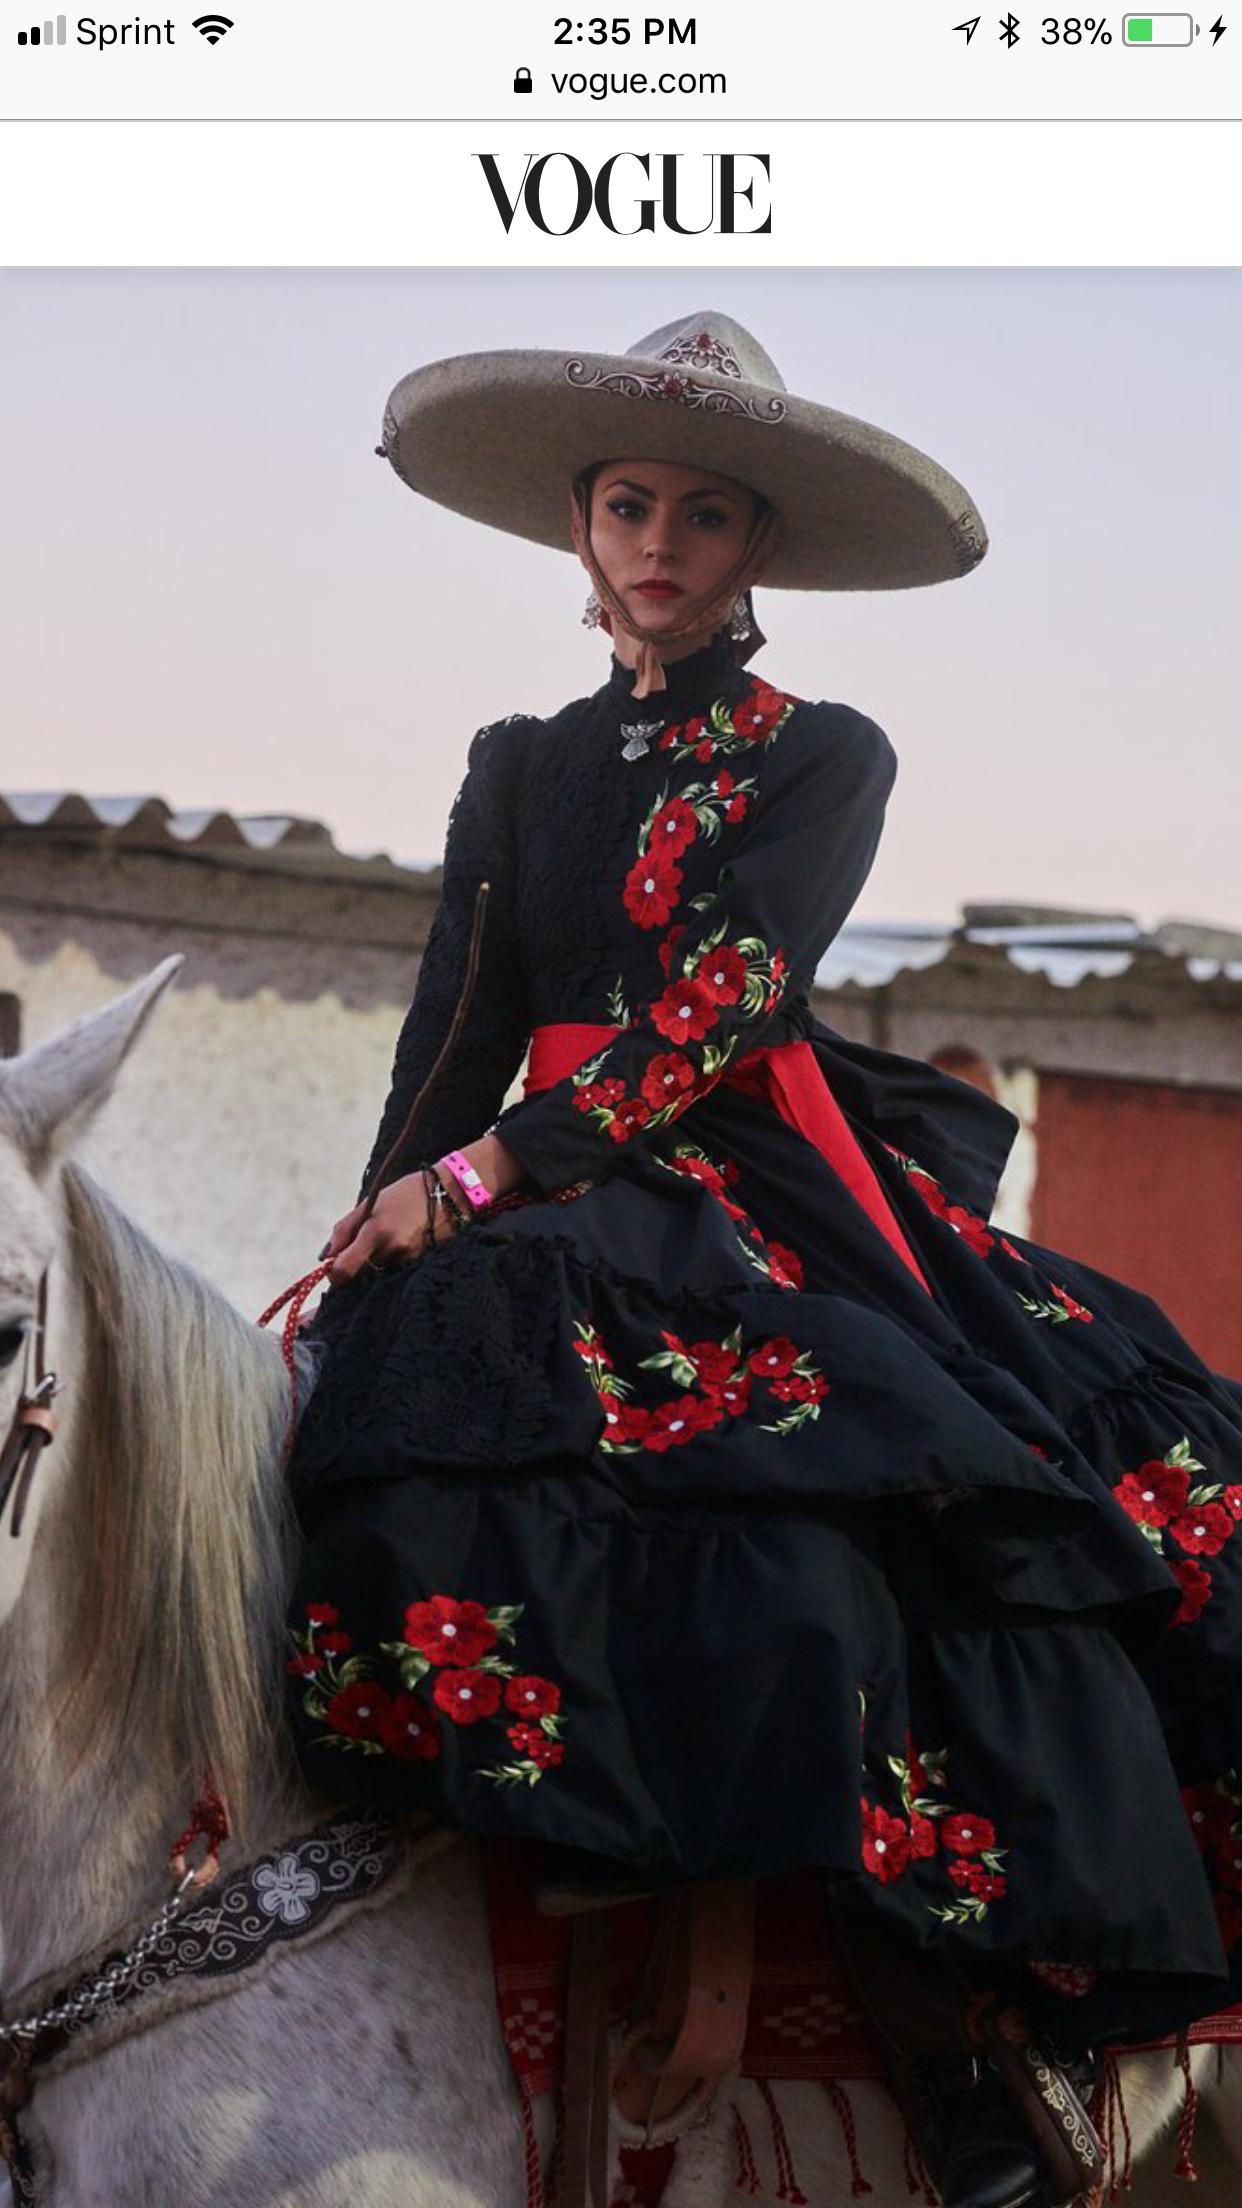 Pin De Valentin En Pura Belleza Vestidos Escaramuza